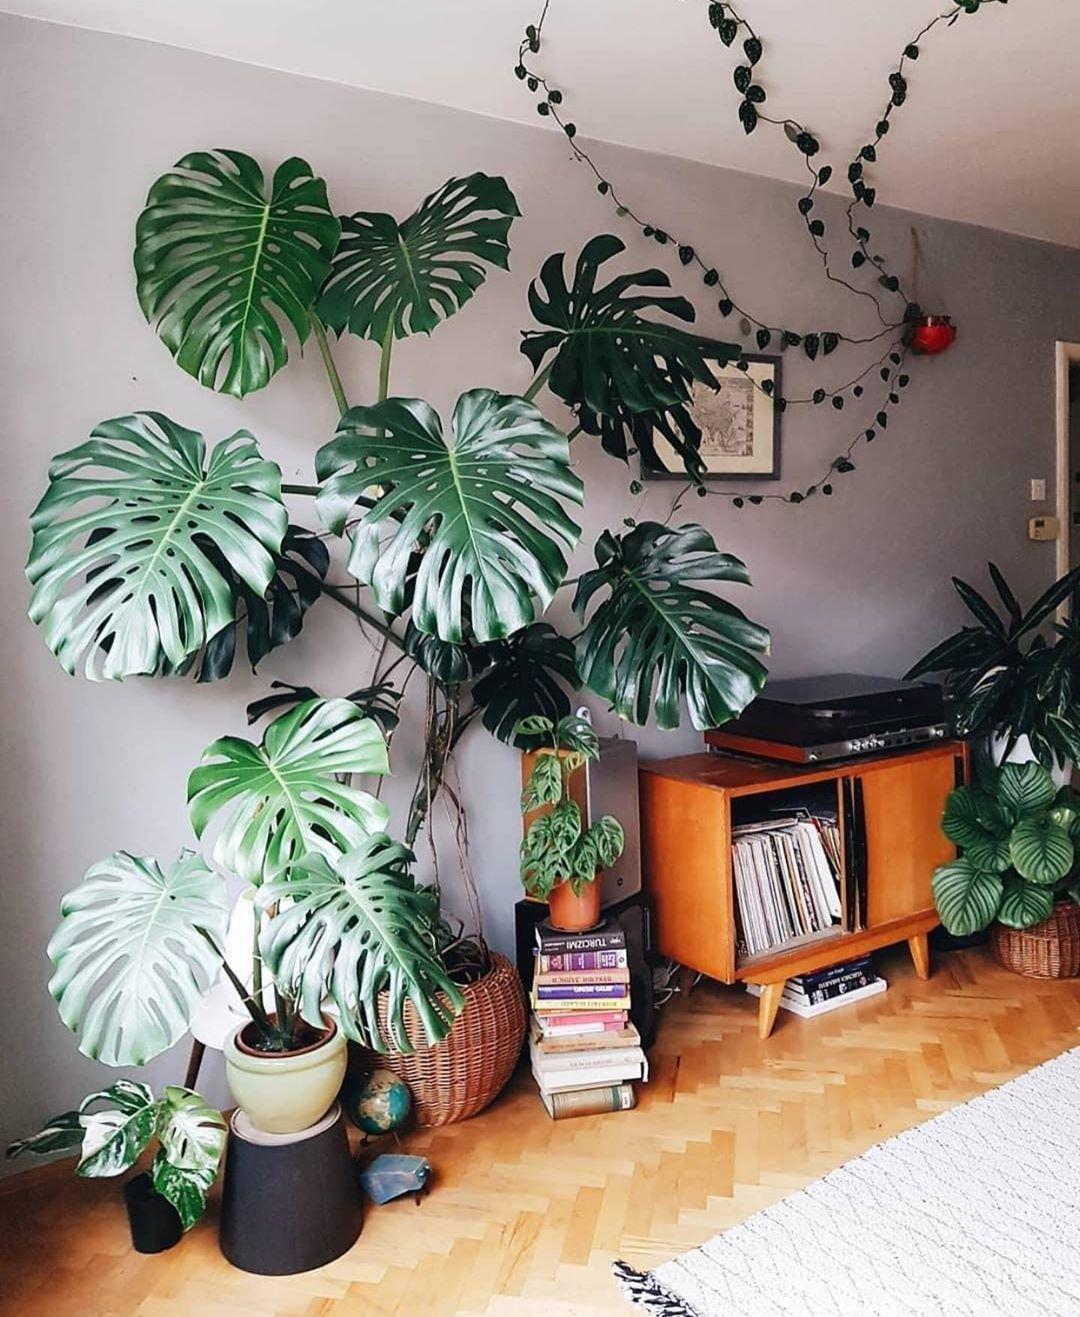 Monsteralicious House Plants Decor Bedroom Plants Plant Decor Indoor